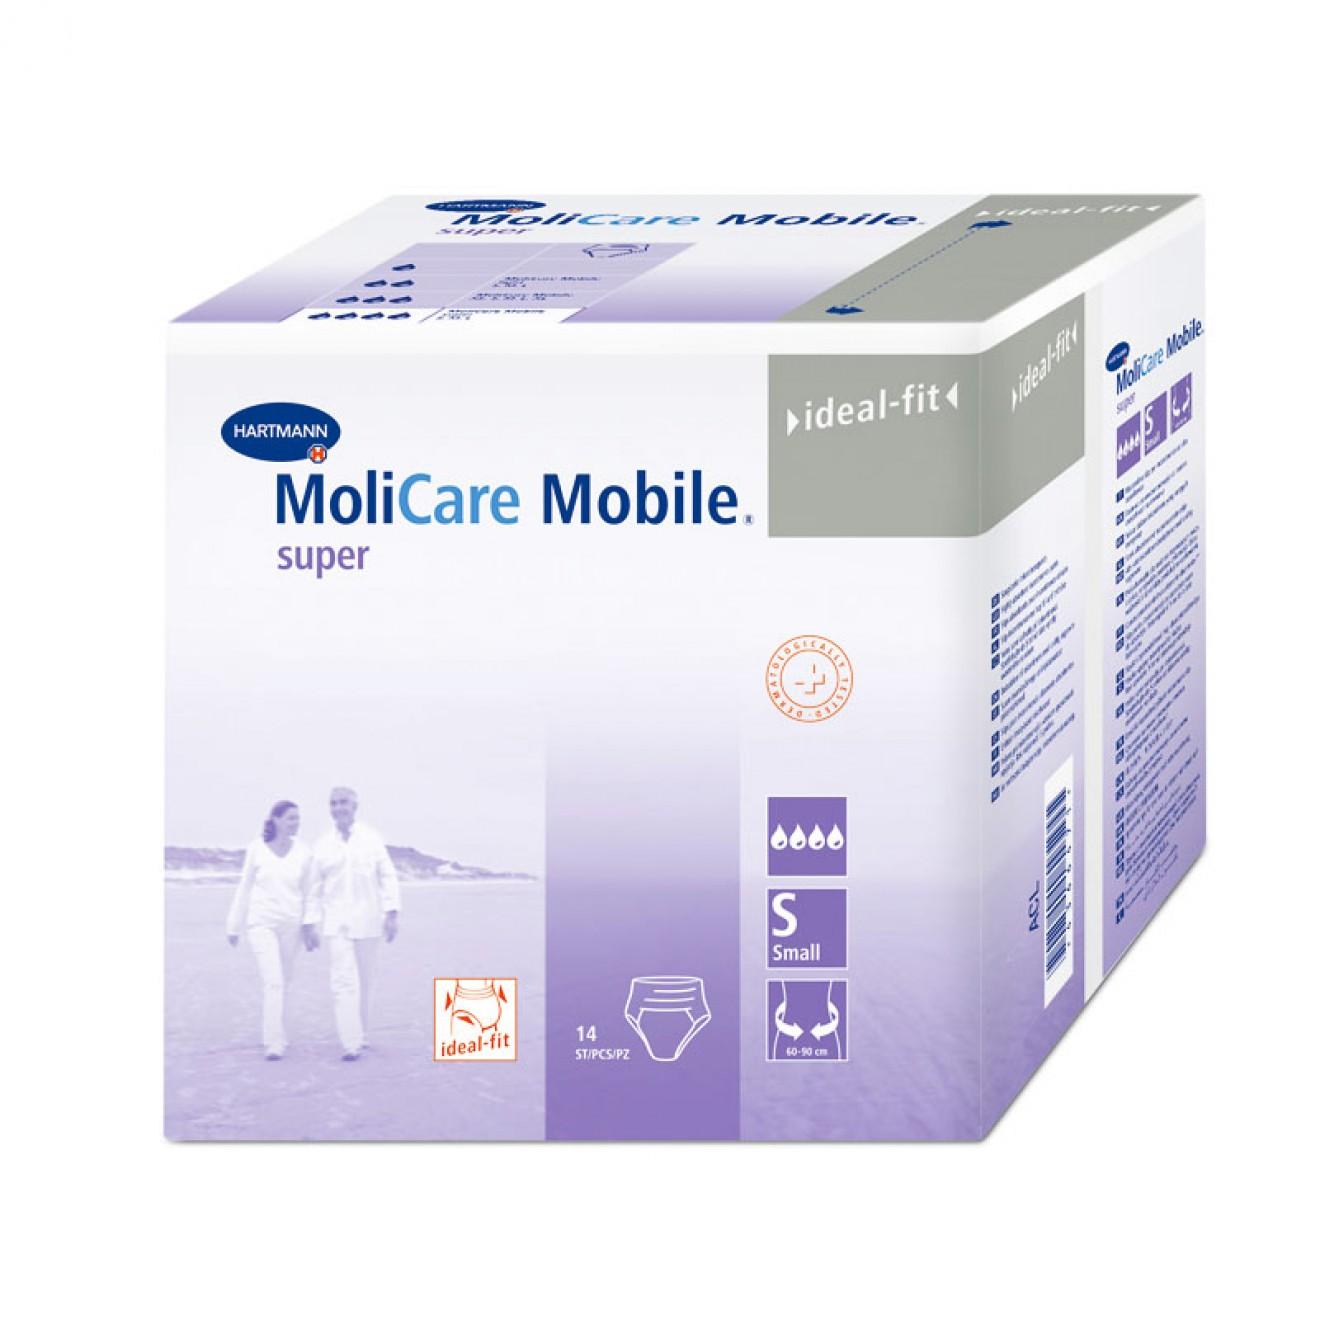 MOLICARE Mobile Super Inkontinenz Slip Gr.1 small 14 ST  915871